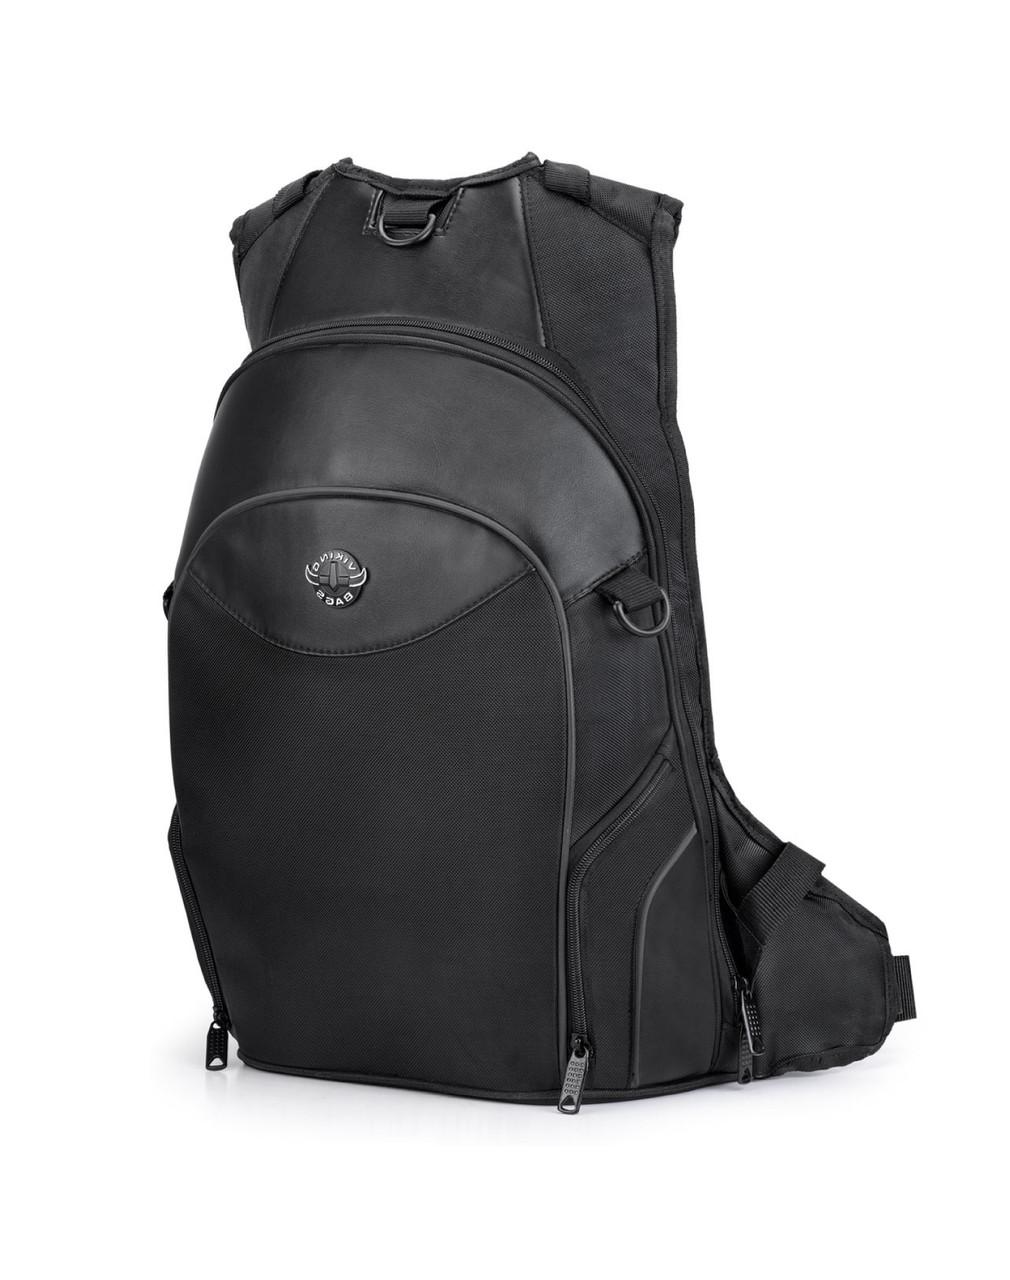 VikingBags AXE Medium Motorcycle Backpack Main View